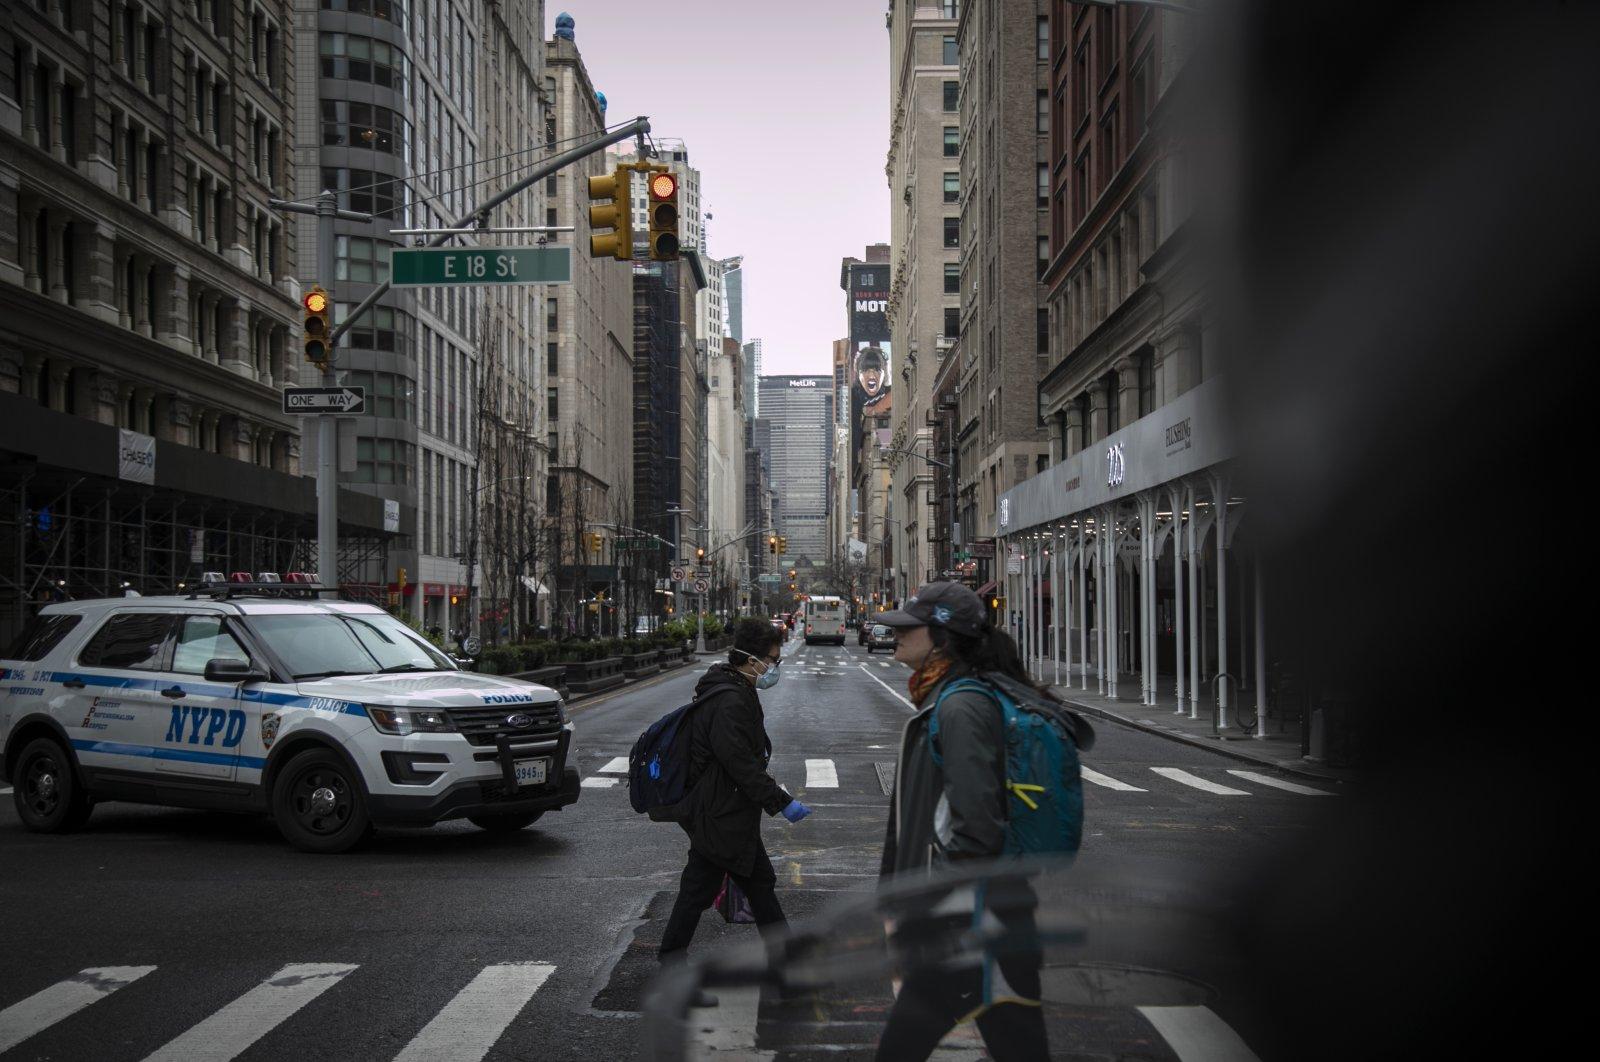 Pedestrians, one wearing a face mask, cross Park Avenue, New York City, New York, U.S., March 25, 2020. (AP Photo)